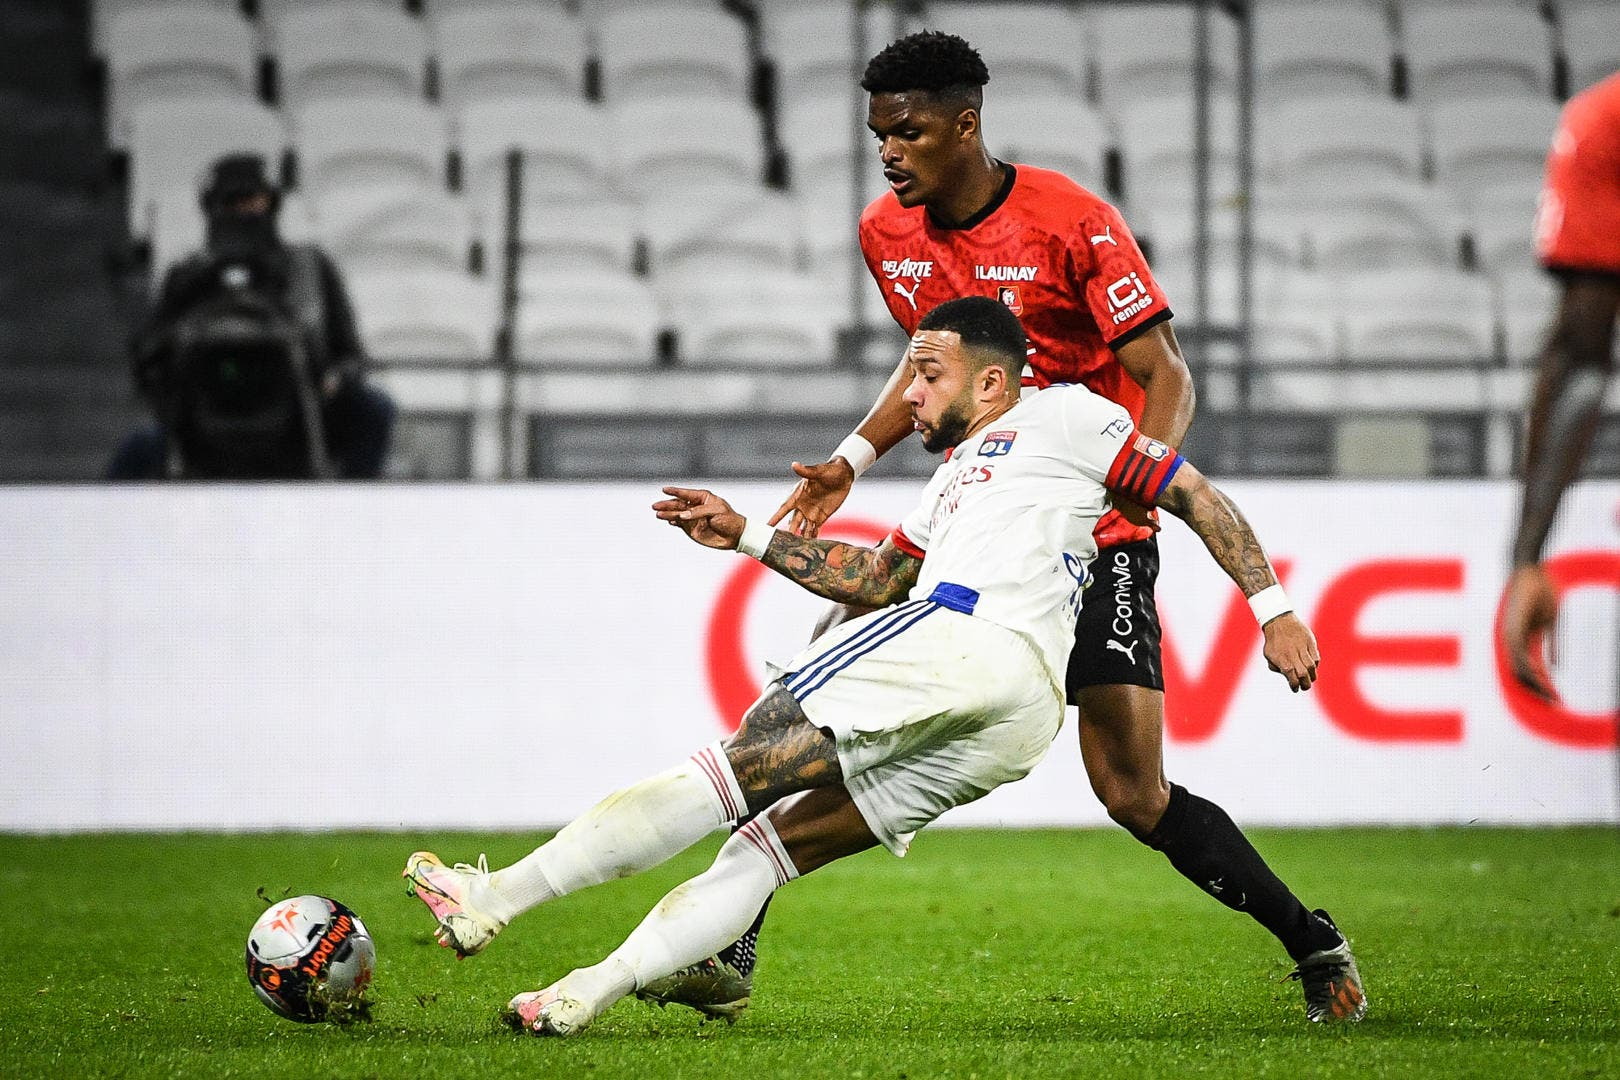 Foot OL - OL : Rudi Garcia a aimé son Lyon - Olympique Lyonnais - Foot 01 - Foot01.com